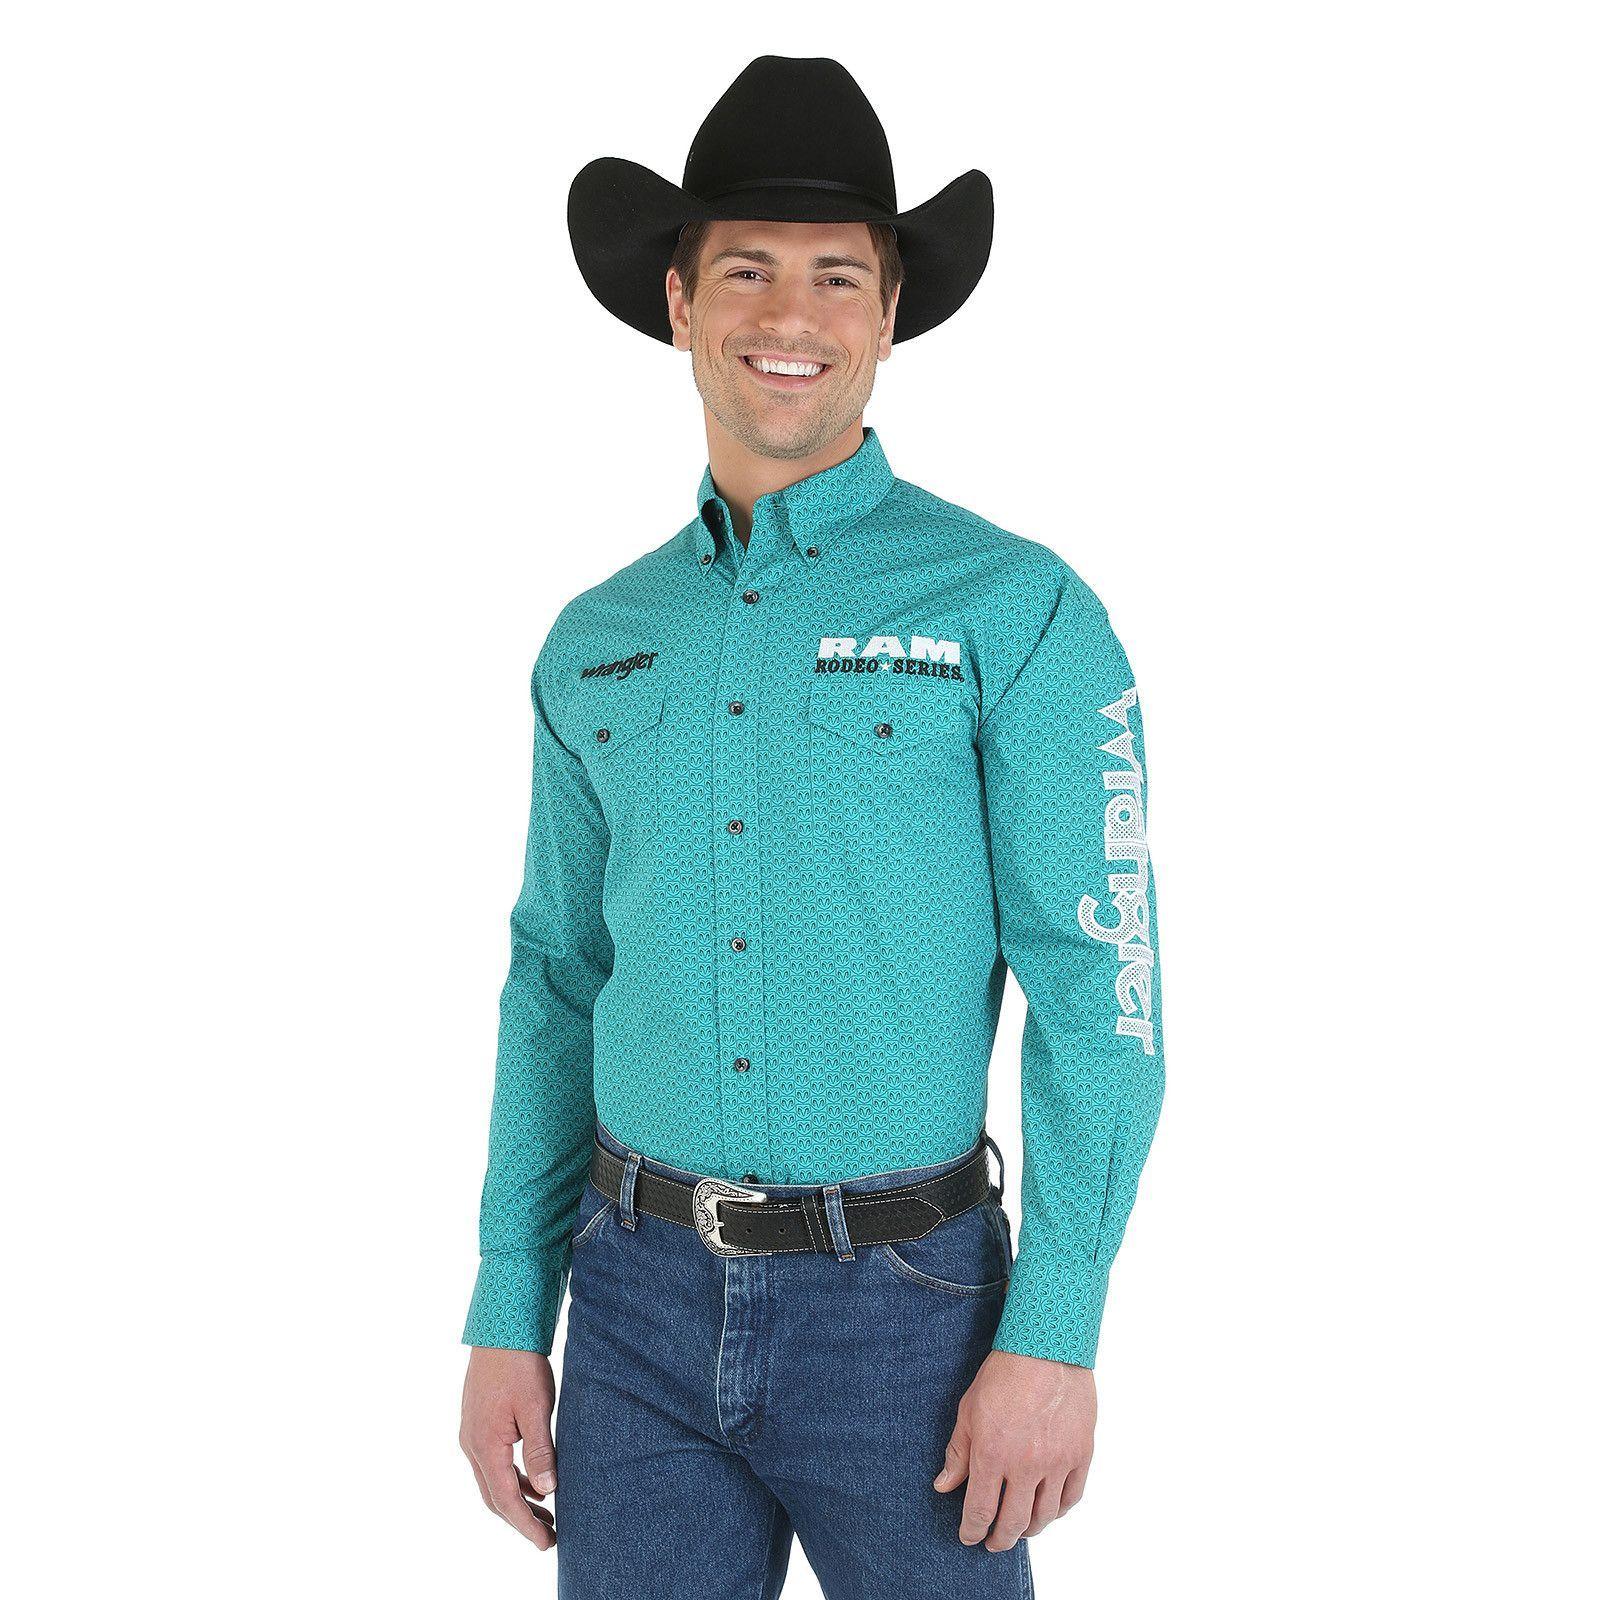 Wrangler Men's Wrangler and Ram Rodeo Series Logo Long Sleeve Button Down  Shirt Green